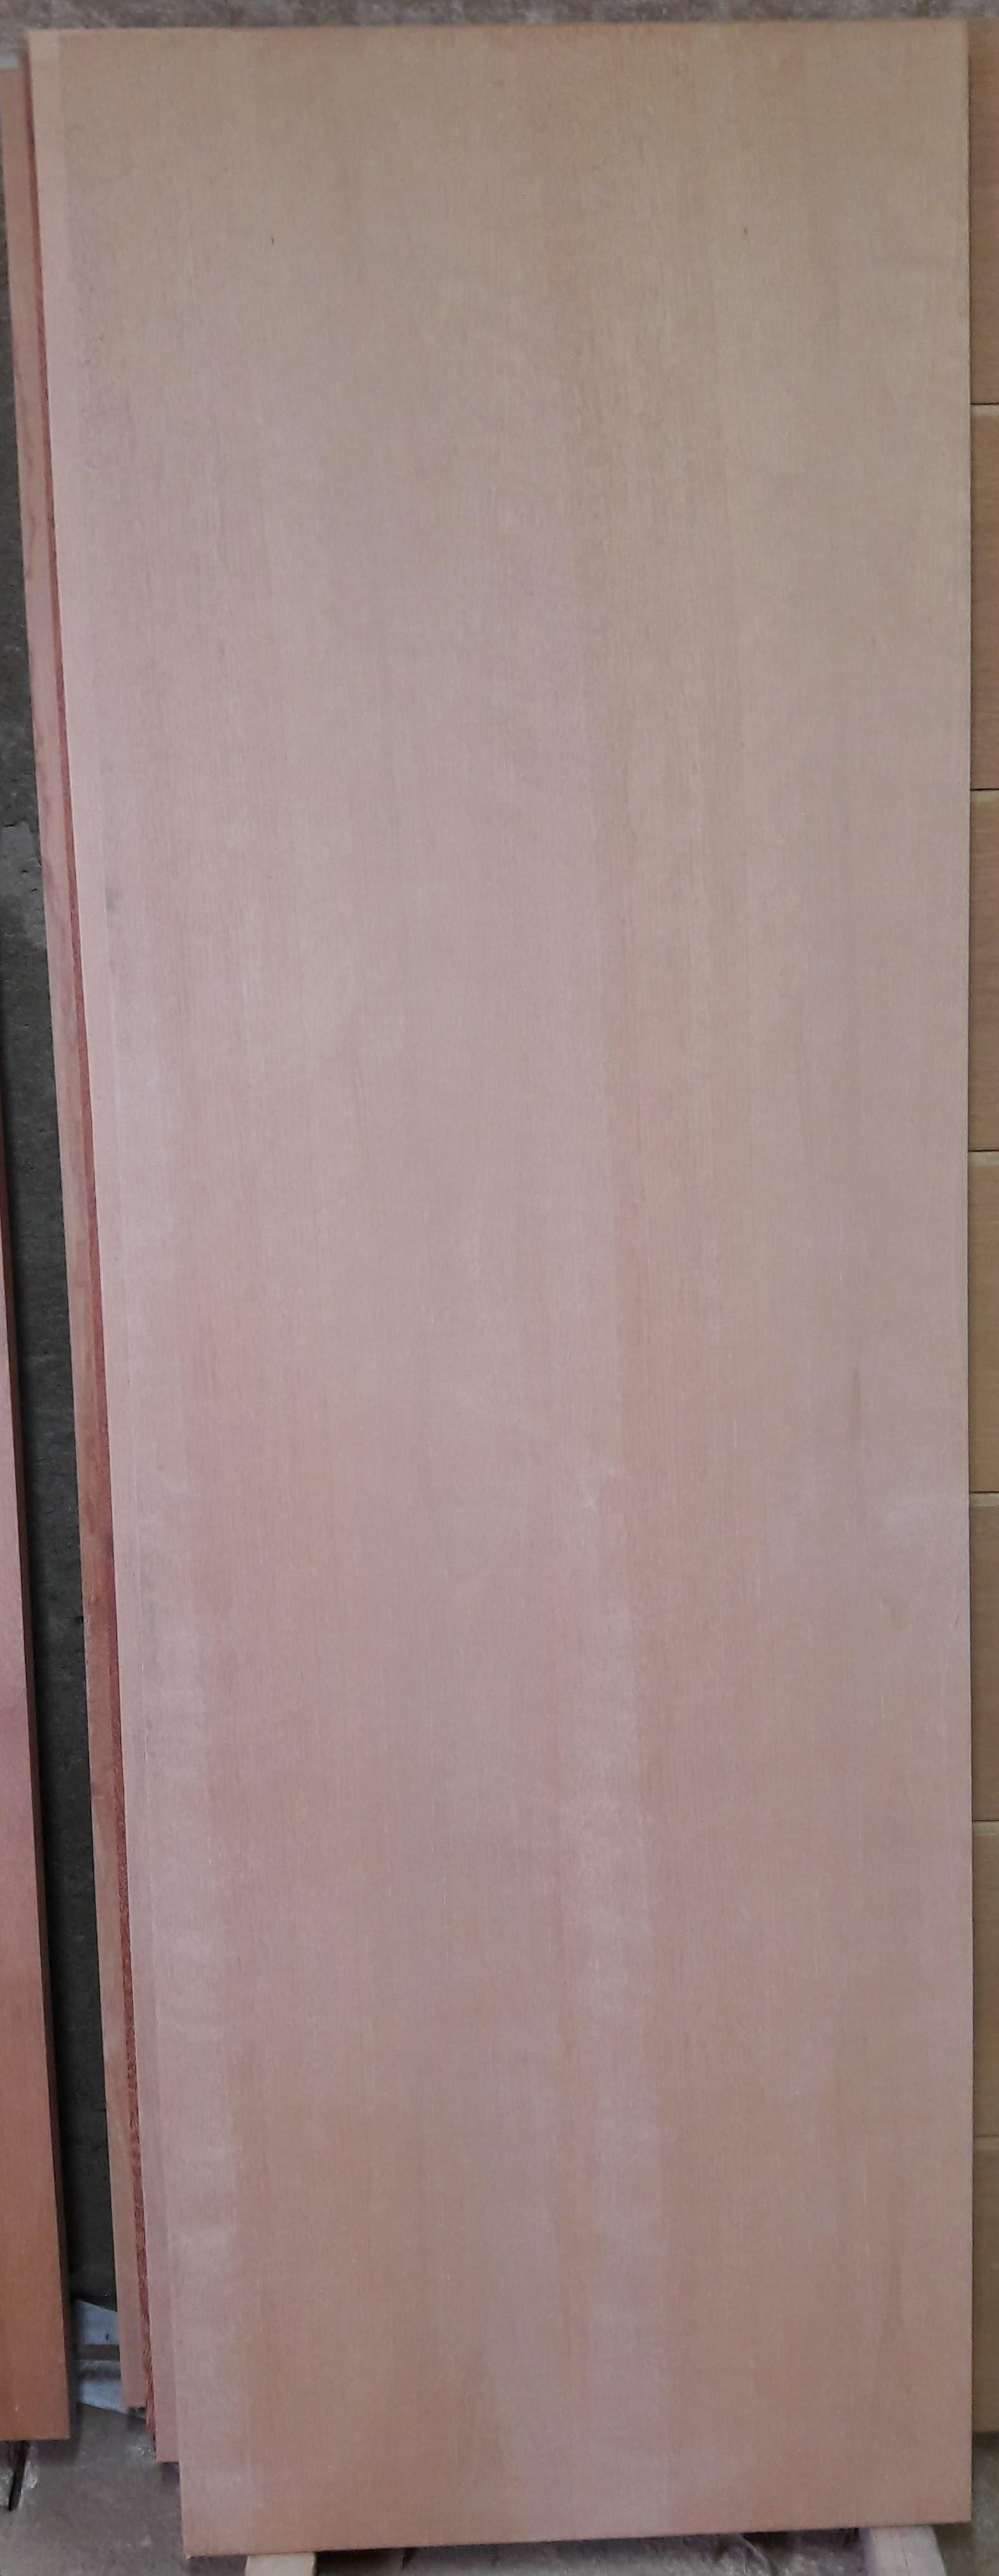 Porta 204 - Crua (sem verniz) e lamina de curupixa.